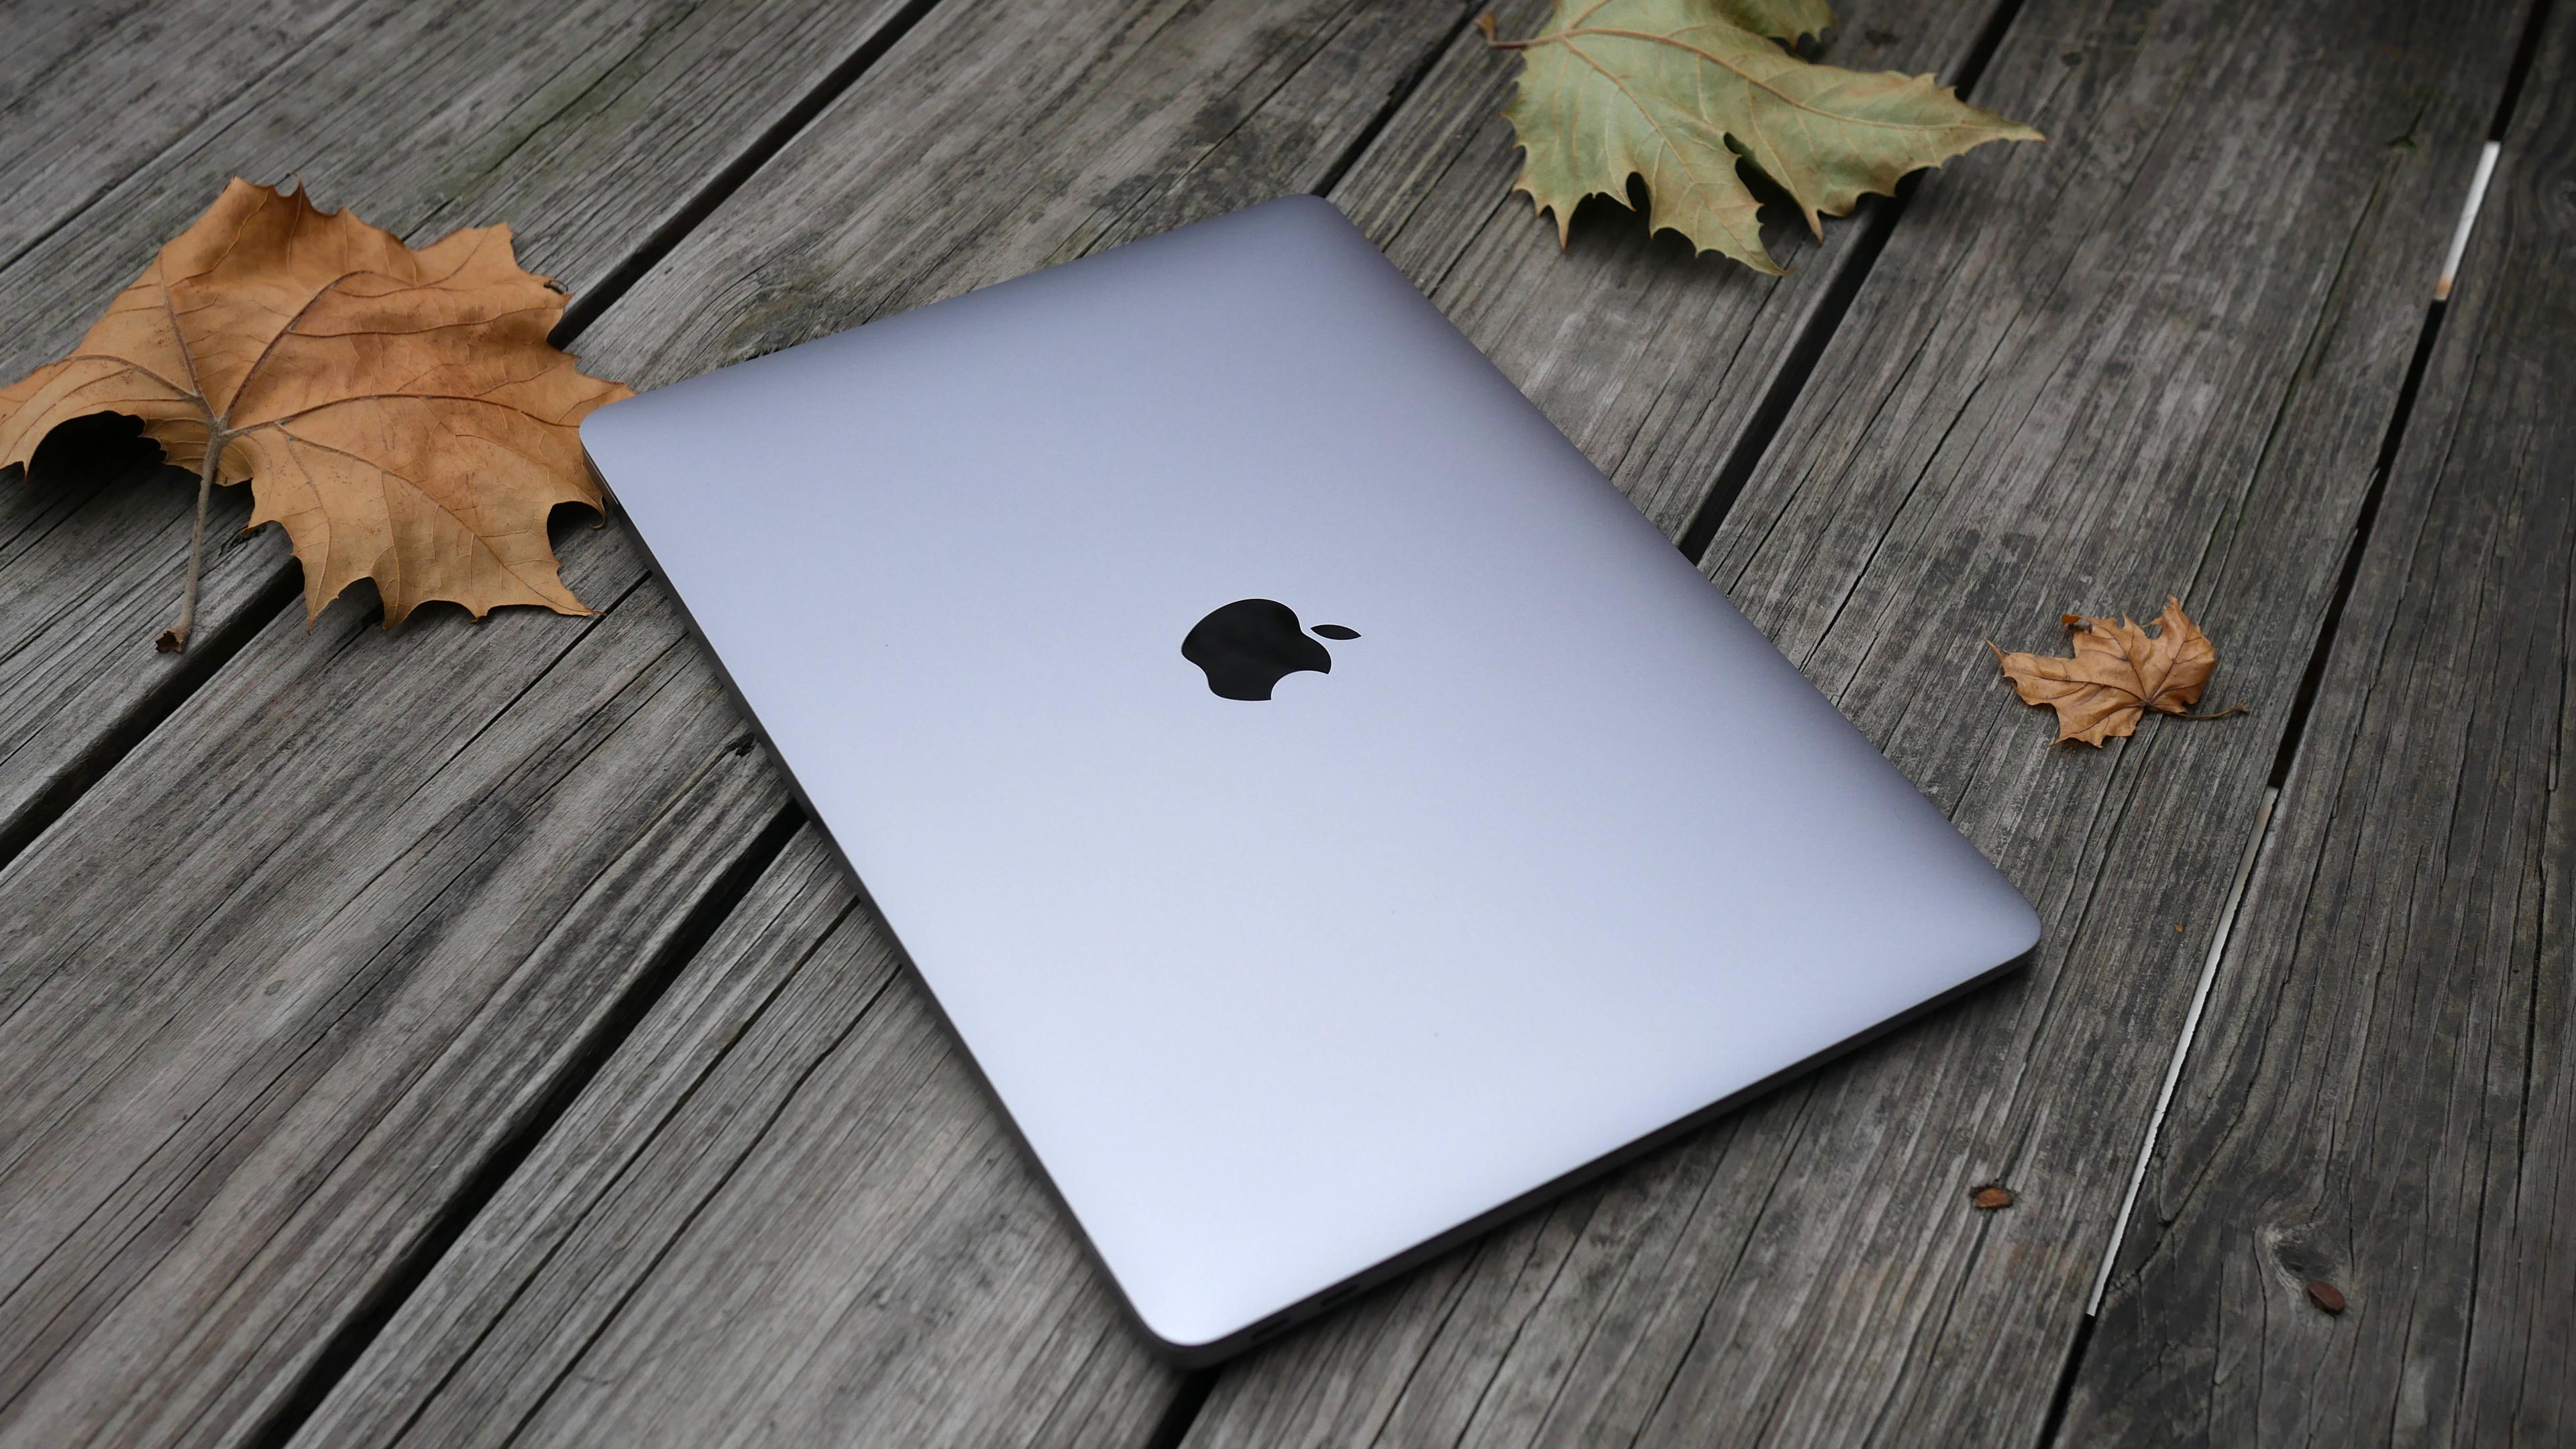 MacBook Air vs. MacBook Pro: Which Mac Should You Buy in 2021? | Laptop Mag